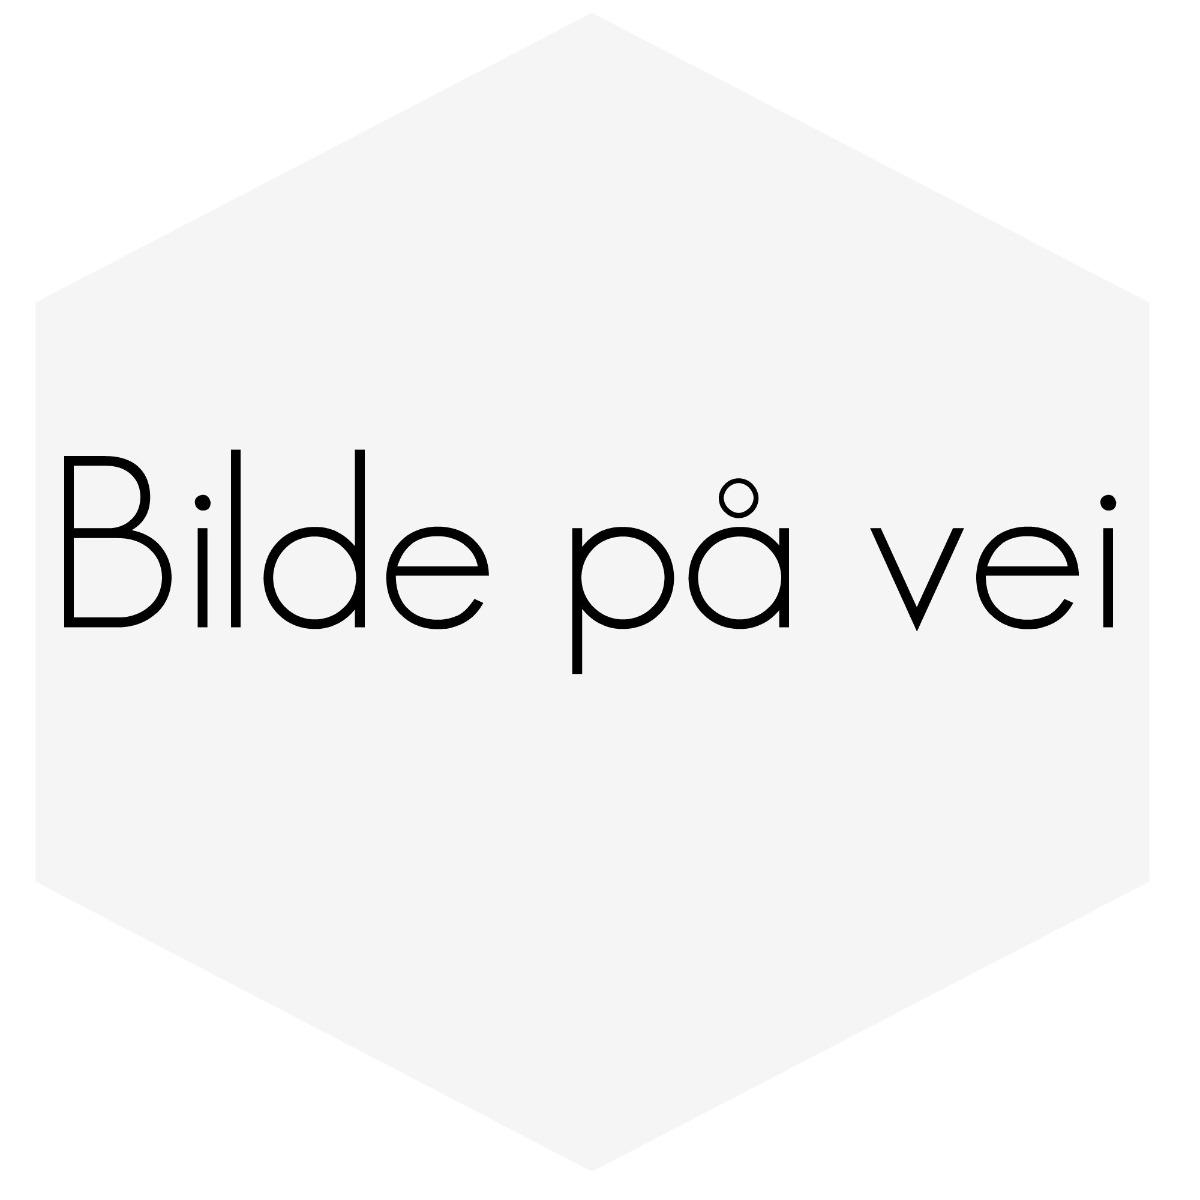 SIKRING PORSELEN 16A RØD